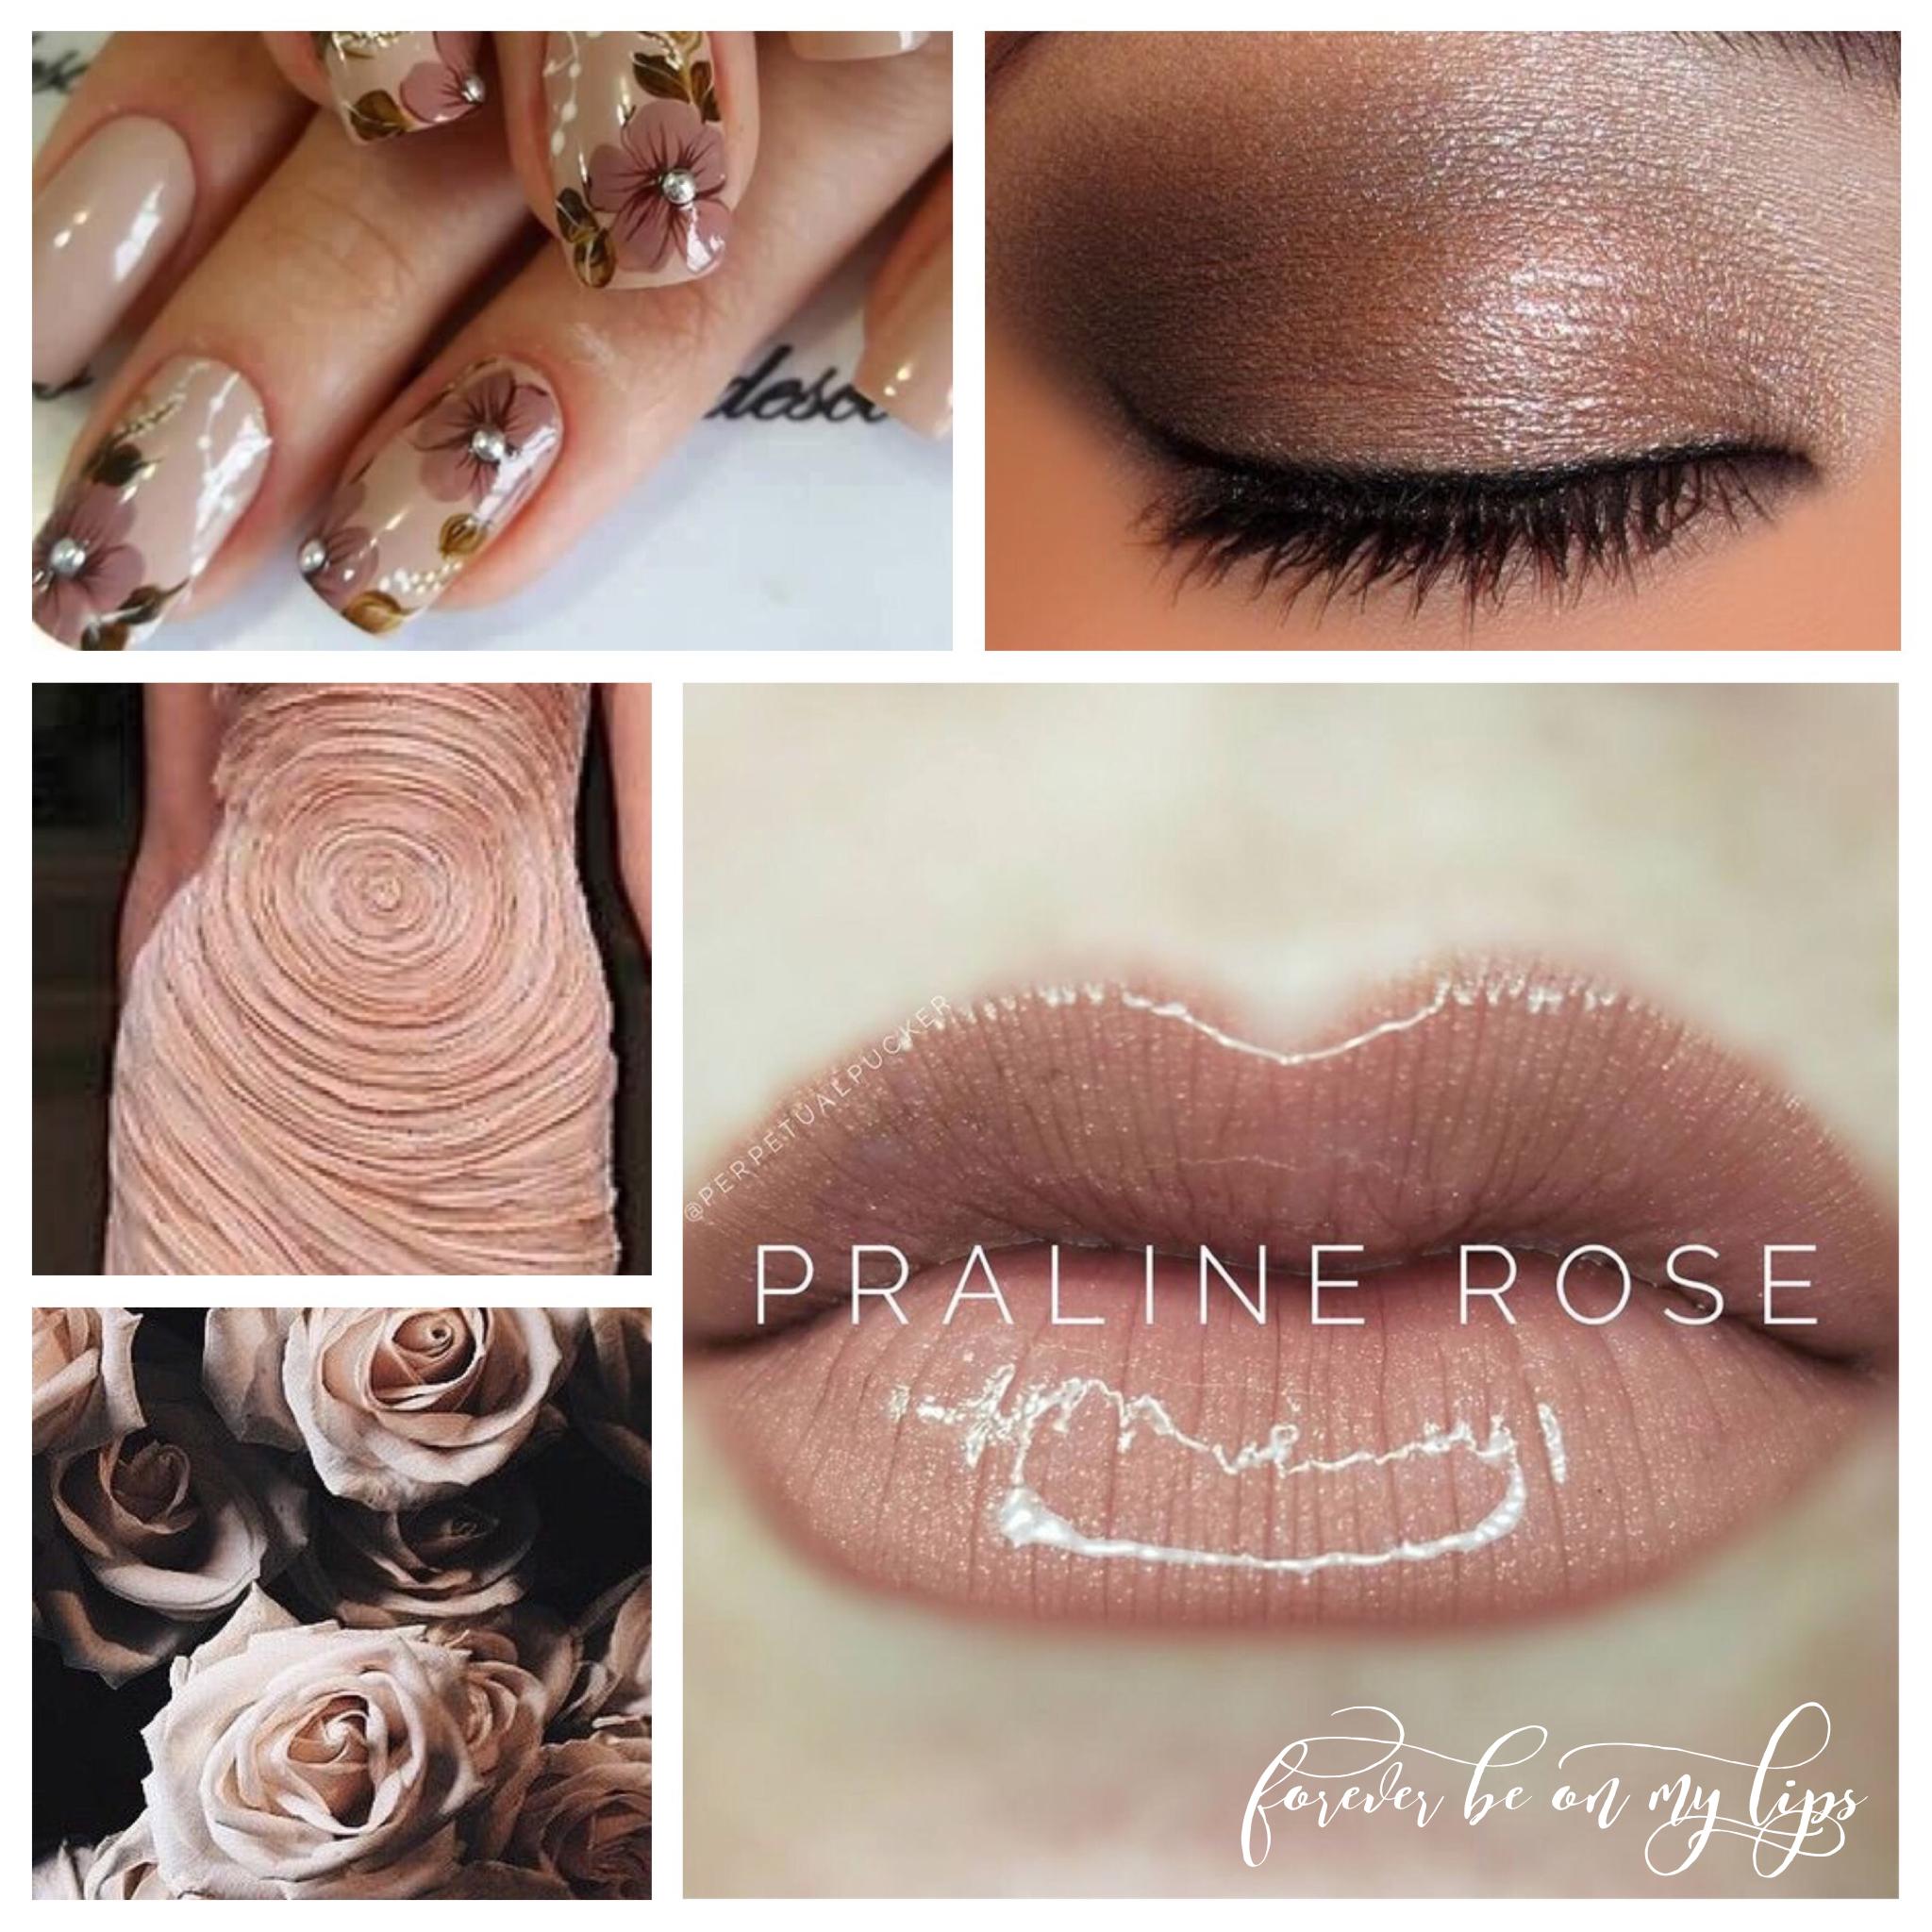 Praline Rose Lipsense Collage Contact Me Dannielle Richmond